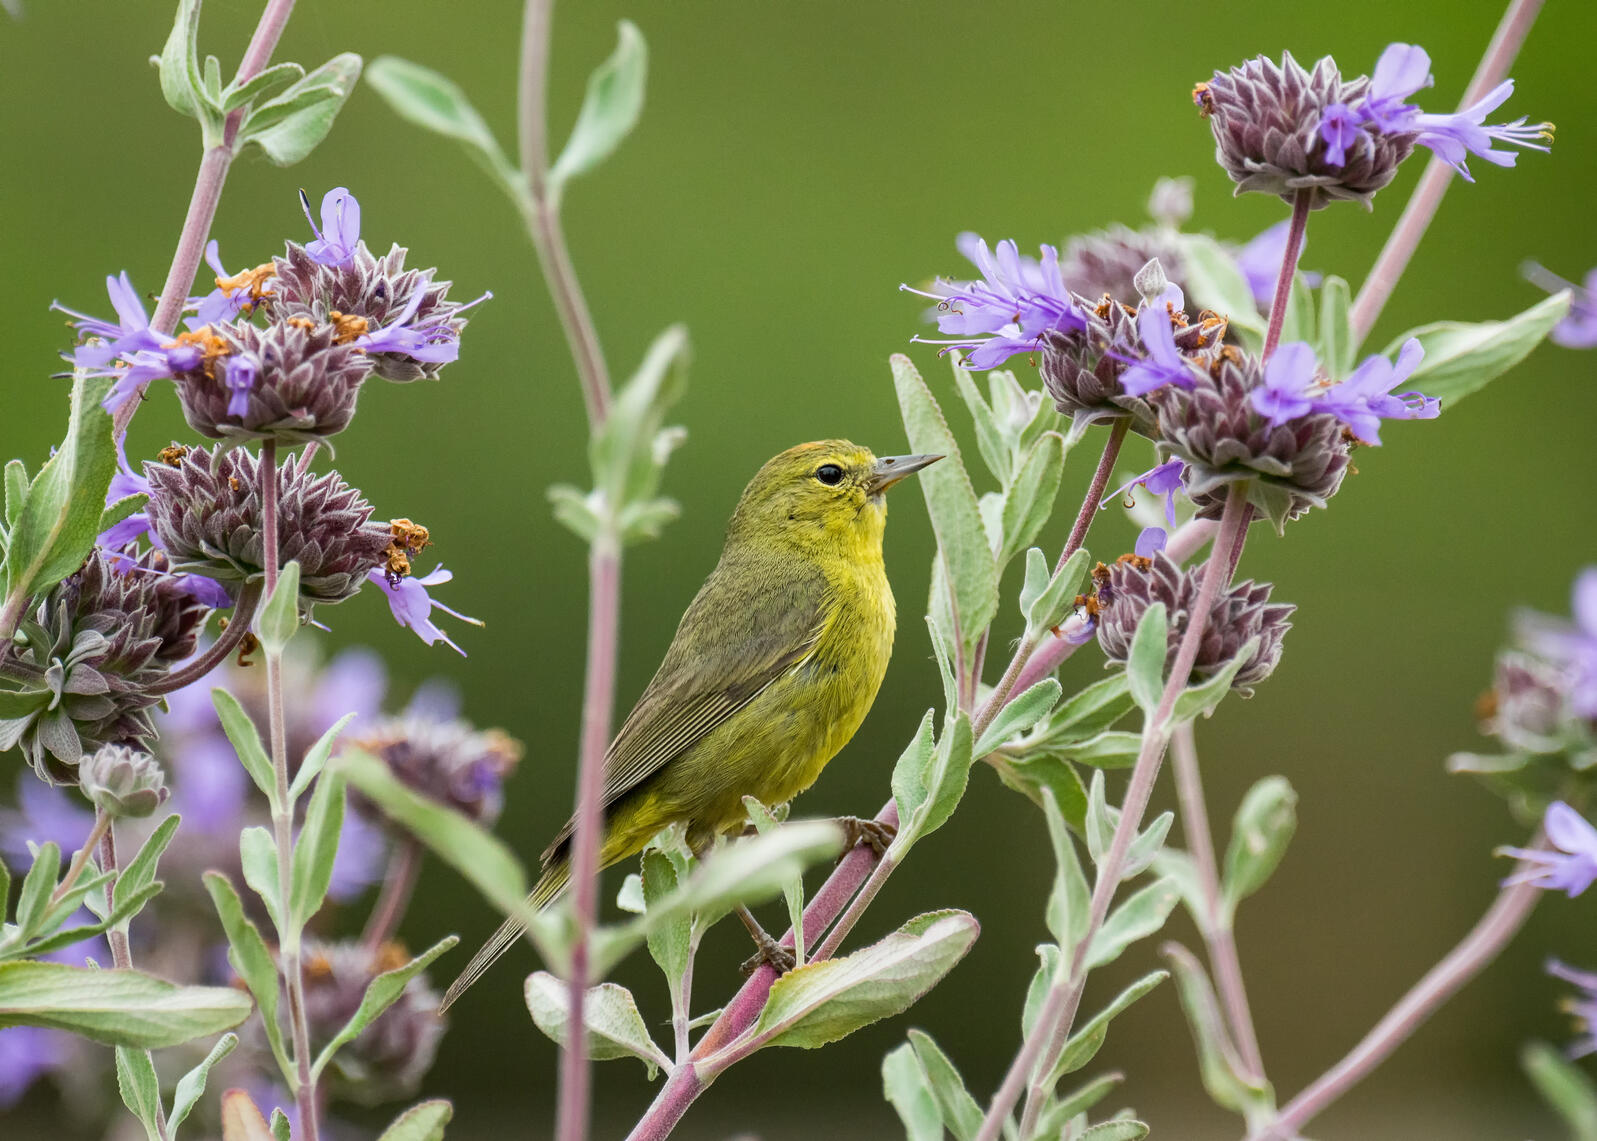 Orange-crowned Warbler. Orange-crowned Warbler. Devin Grady/Audubon Photography Awards